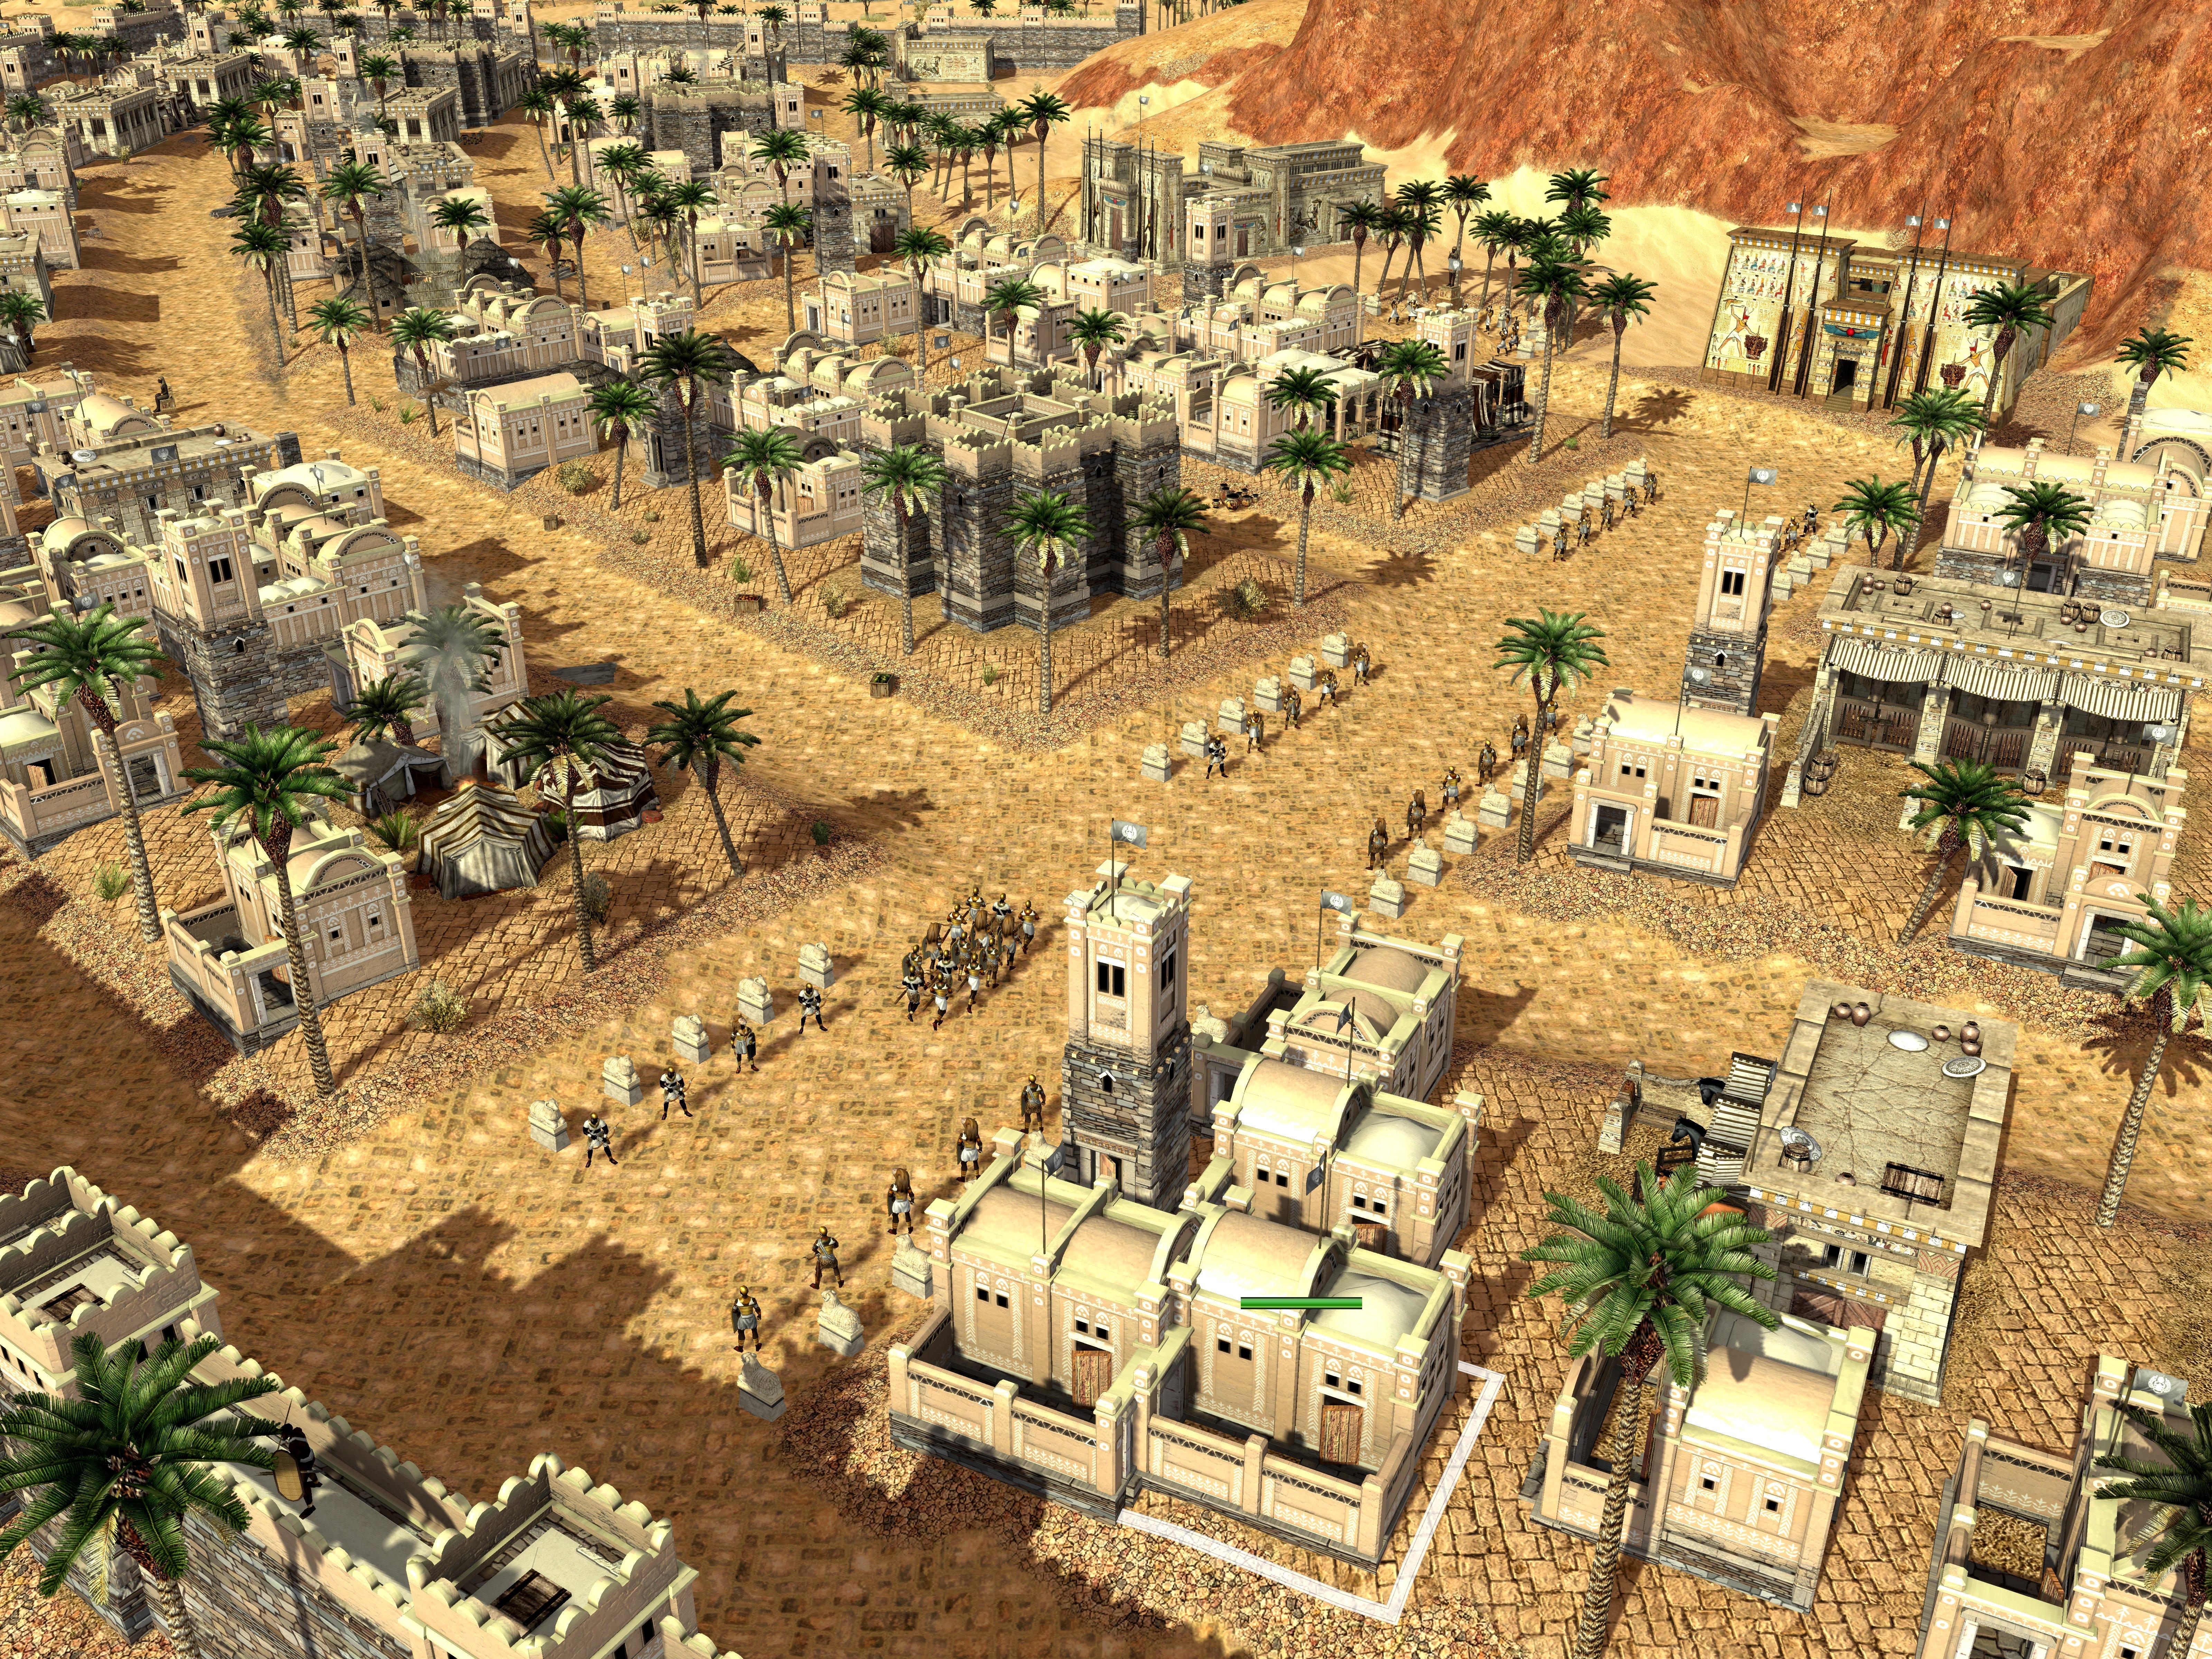 0 A D Empires Ascendant Windows Mac Linux Game Mod Db